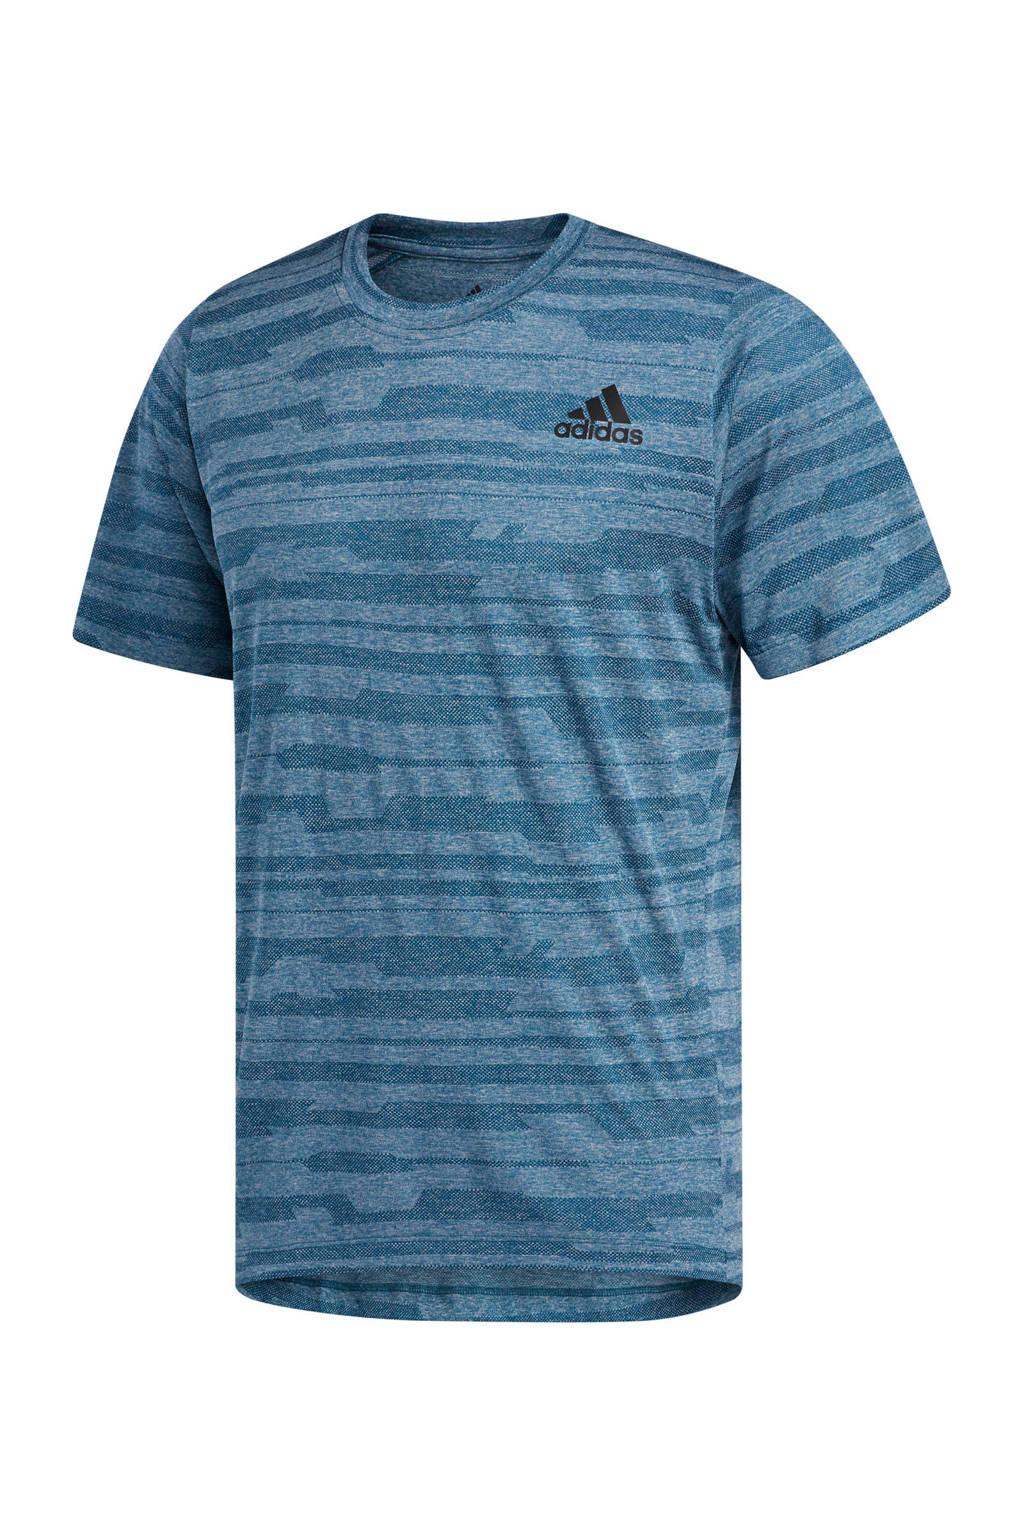 adidas performance   sport T-shirt blauw melange